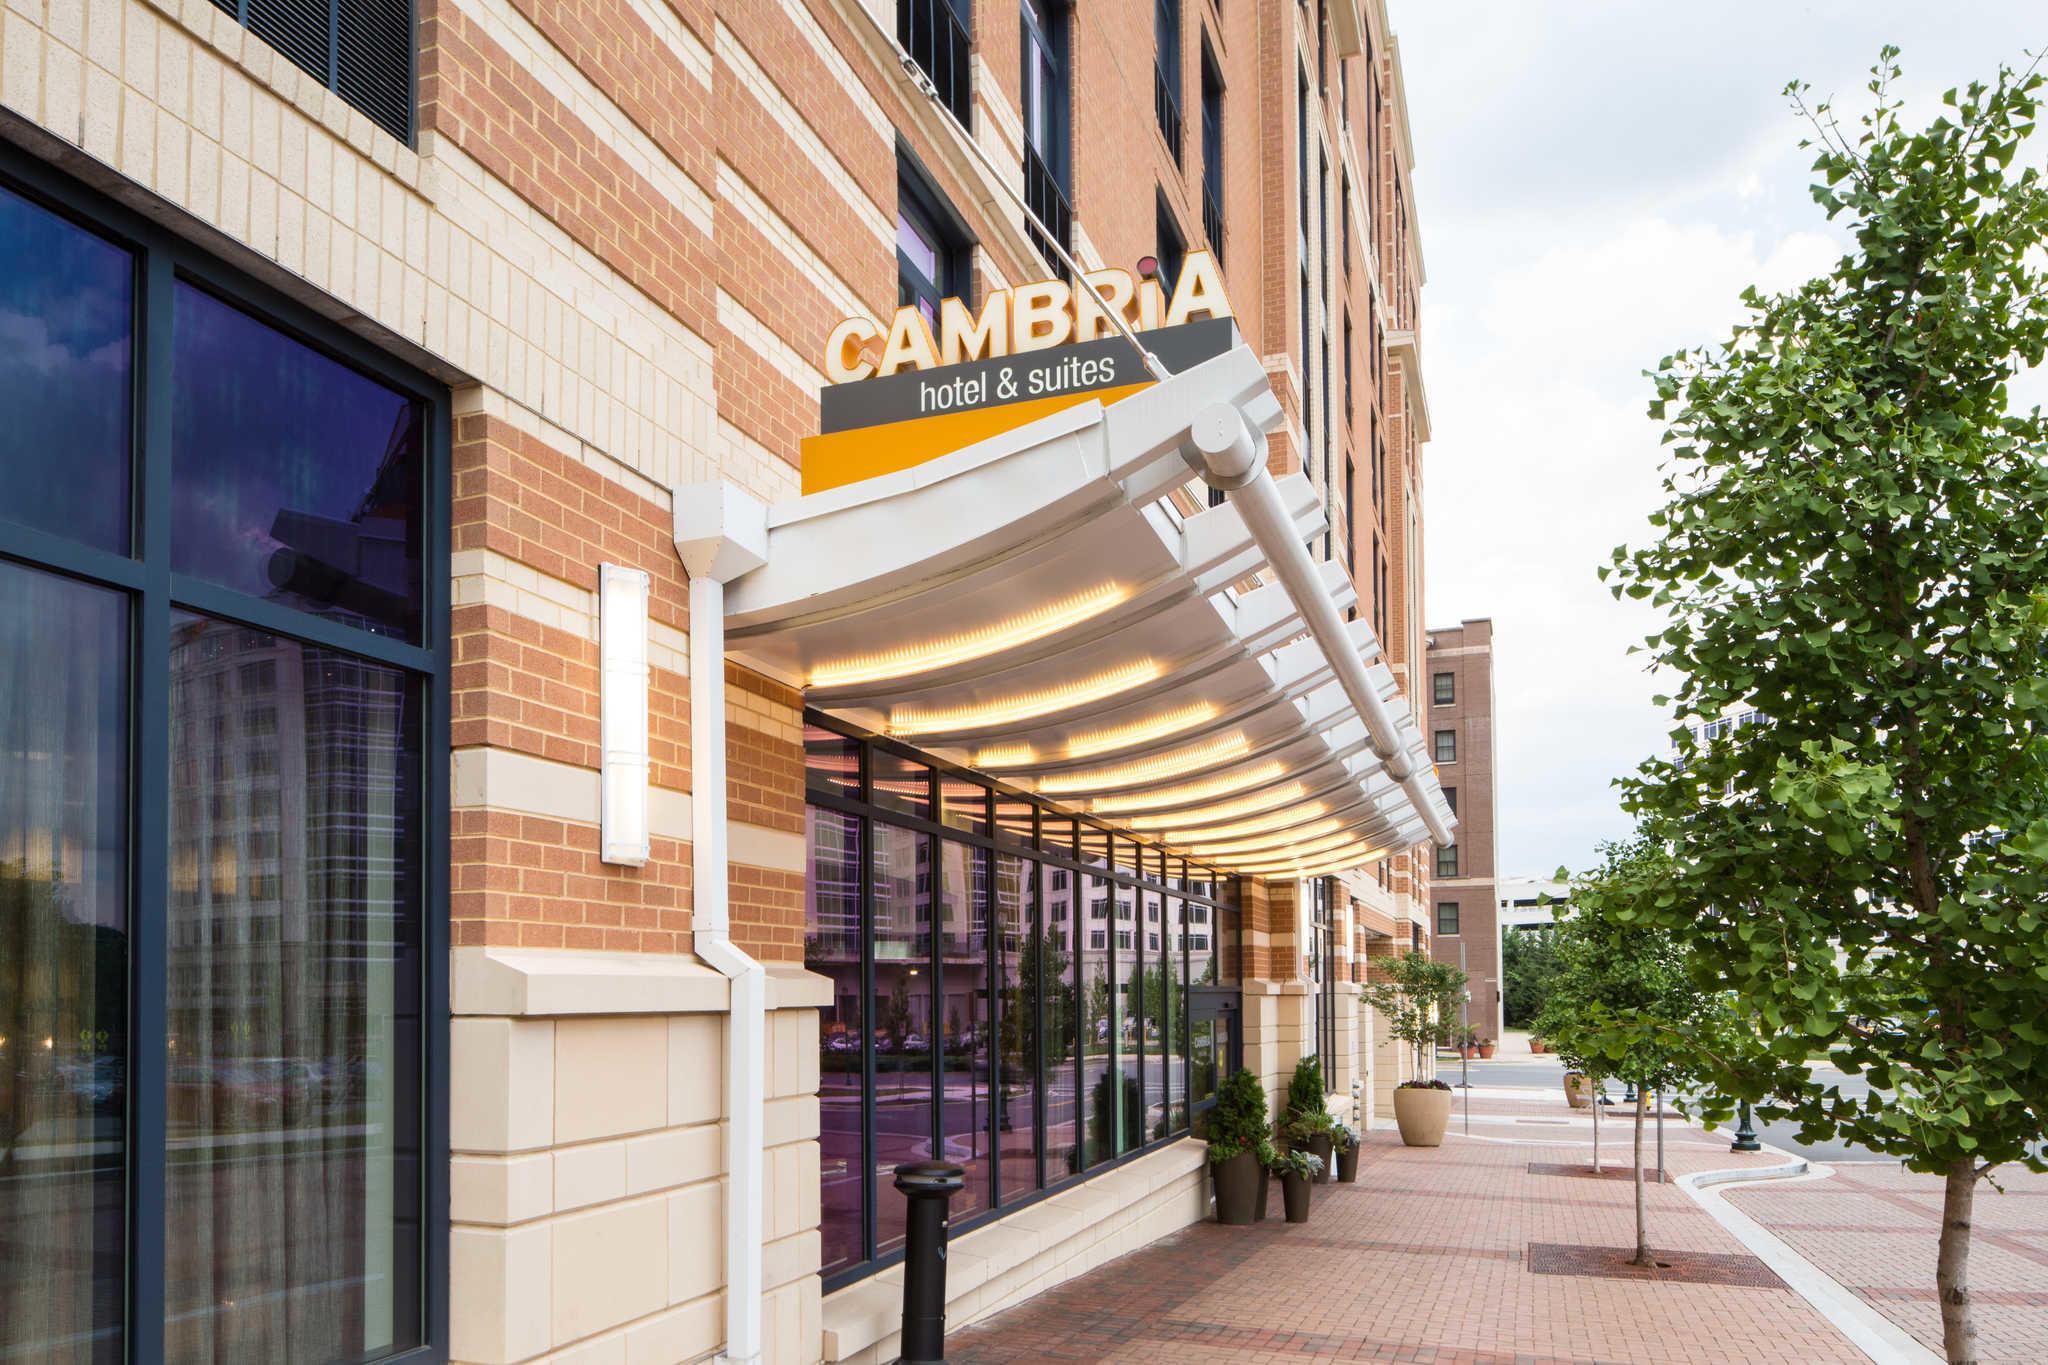 Cambria Hotel Rockville image 1